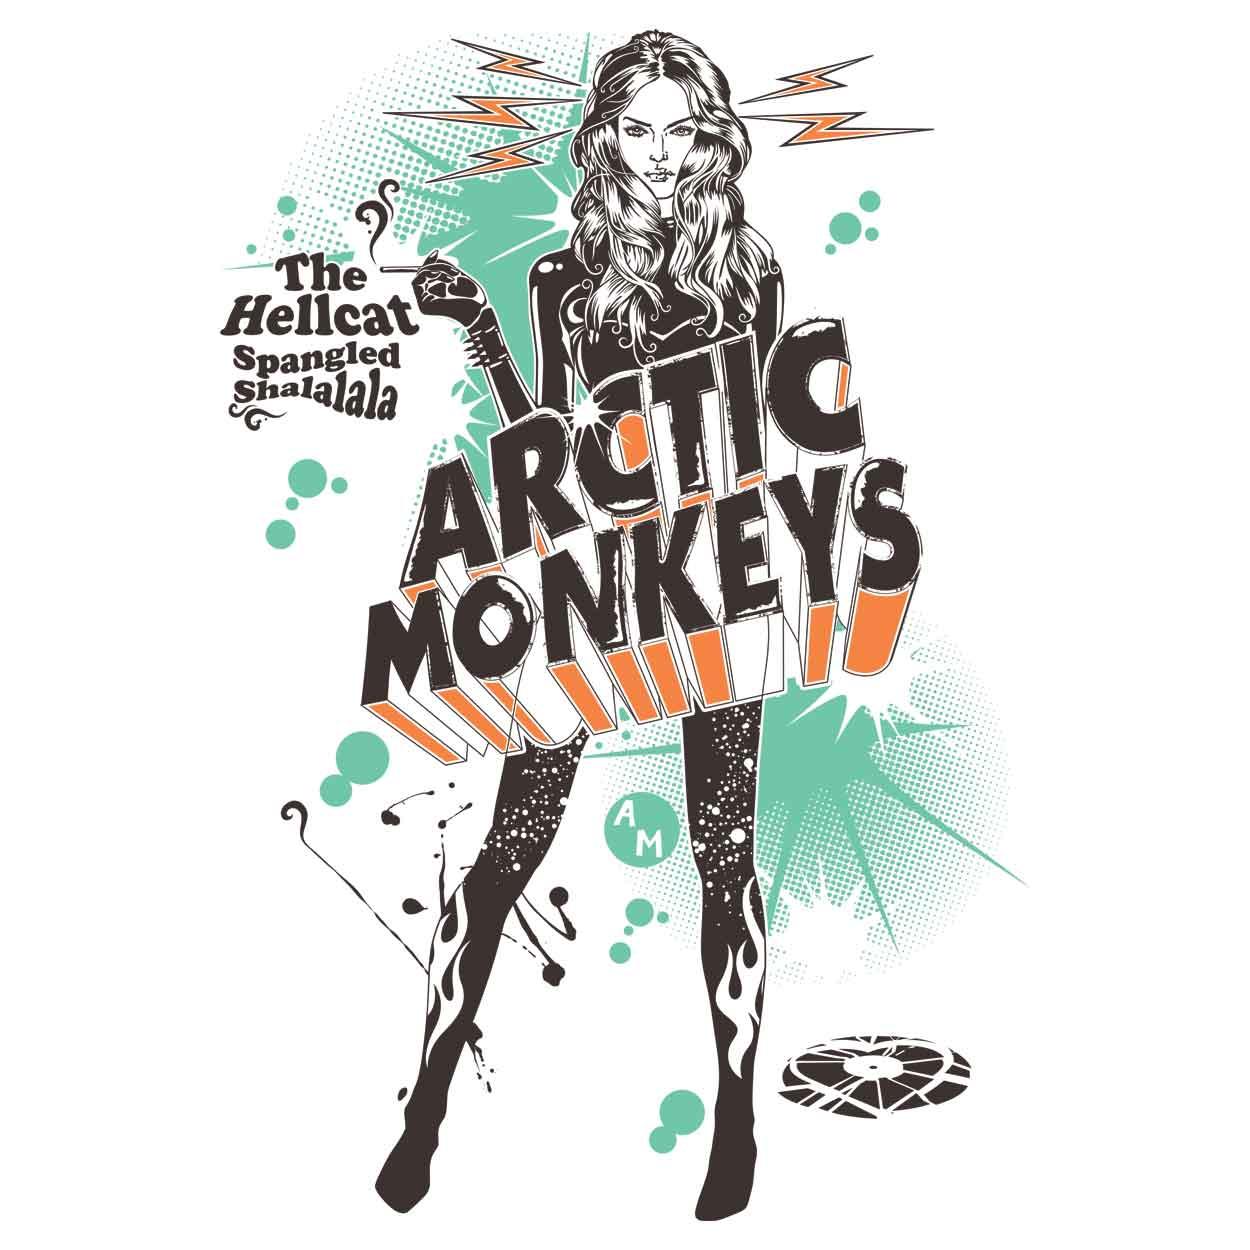 Camiseta The Hellcat Spangled - Arctic Monkeys - Masculino